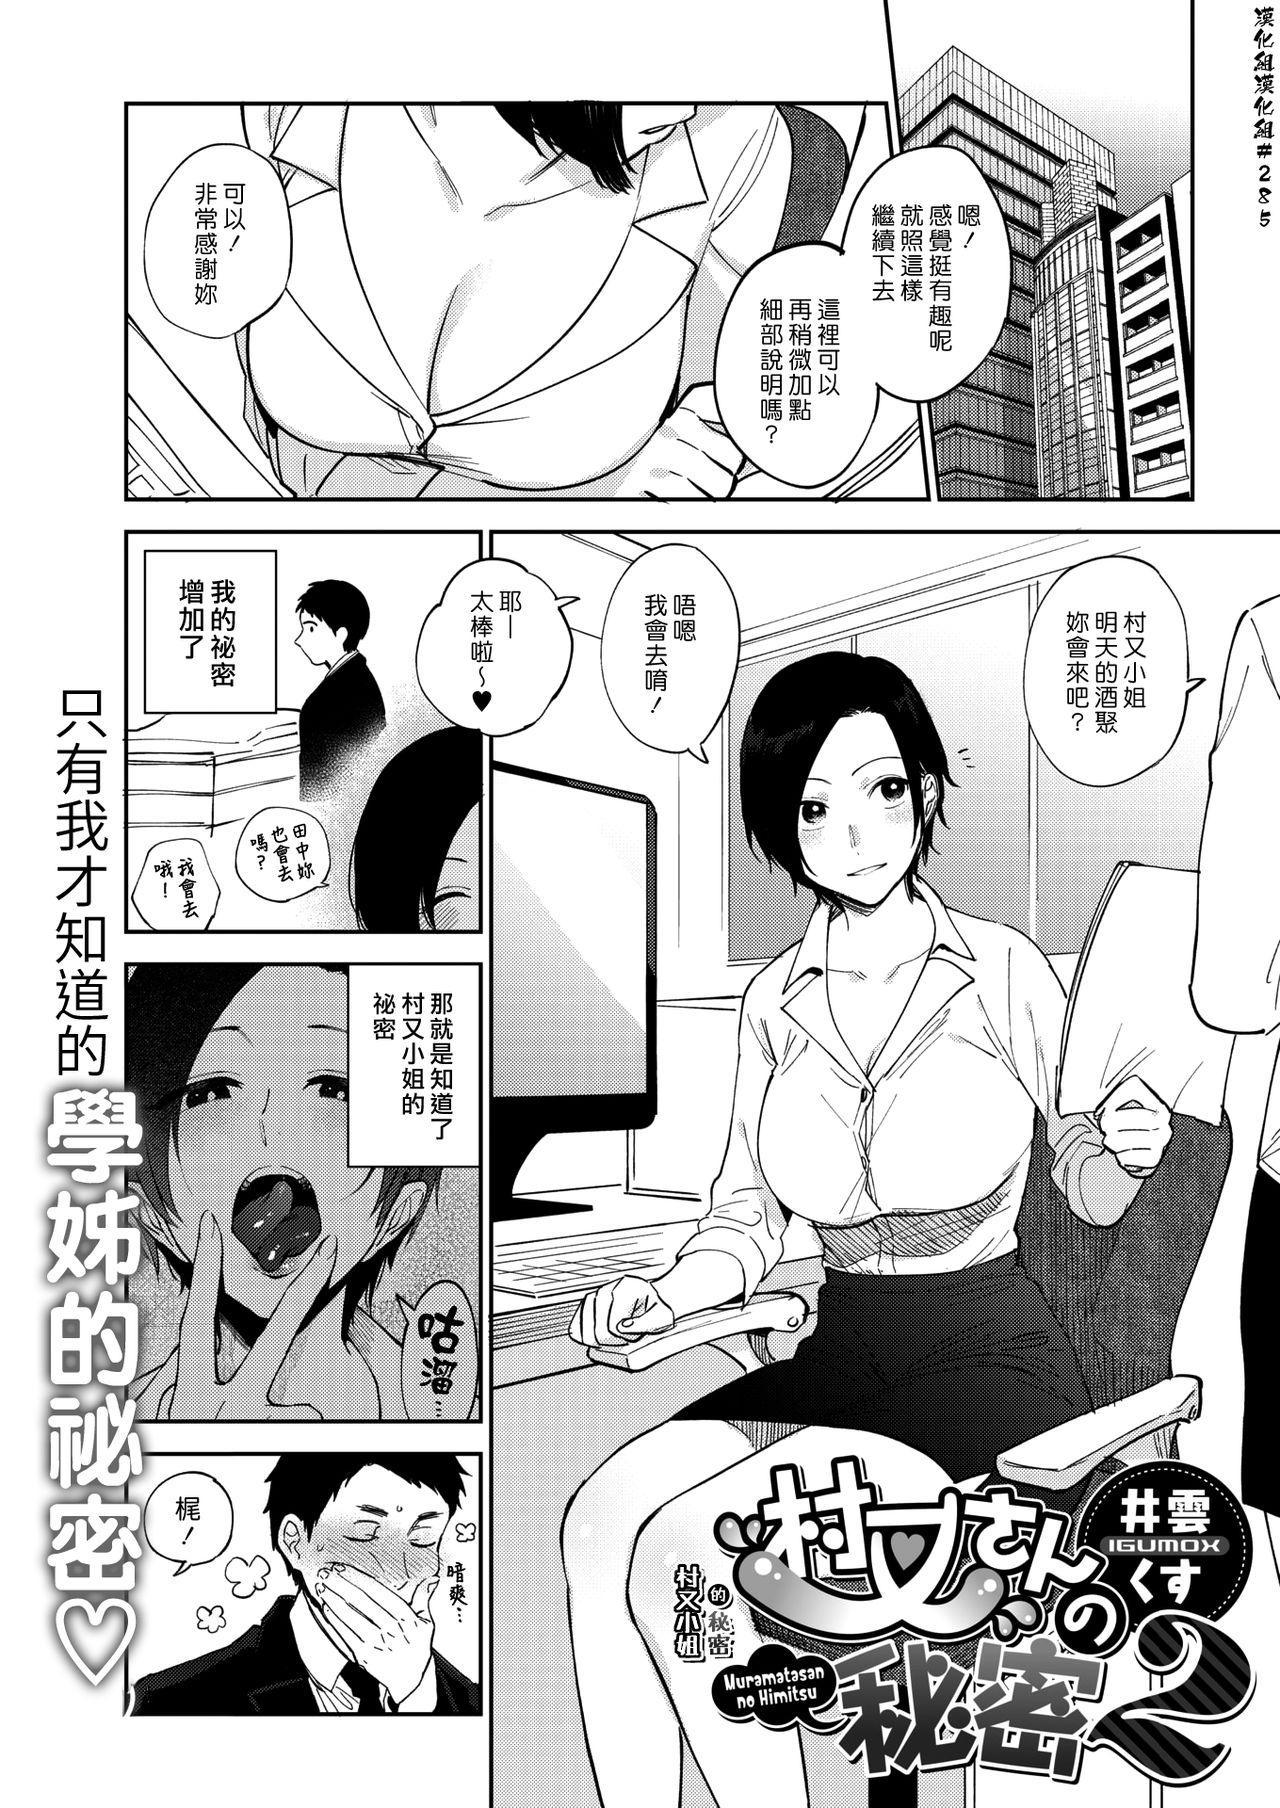 Muramata-san no Himitsu 2 | 村又小姐的秘密 2 0